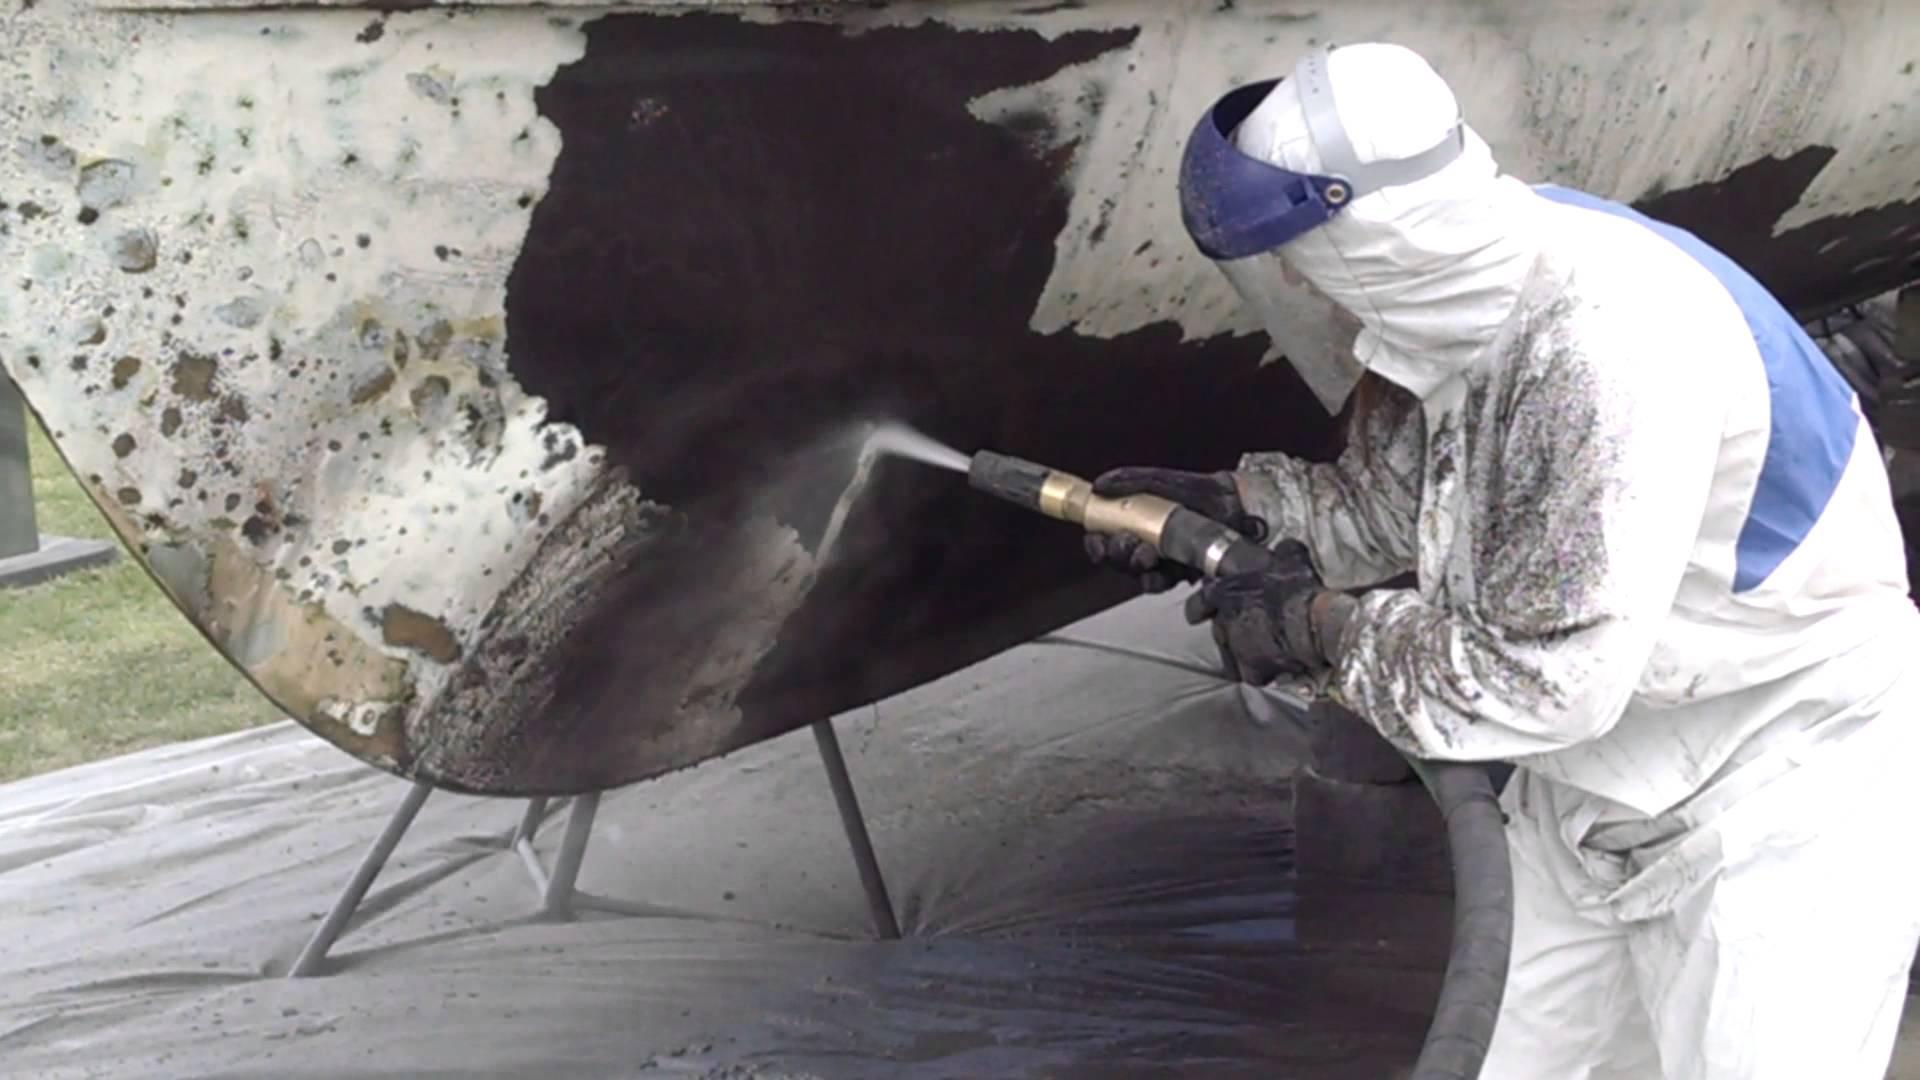 marine - Sandblasting and Dustless Blasting - Removal of anti fouling coatings